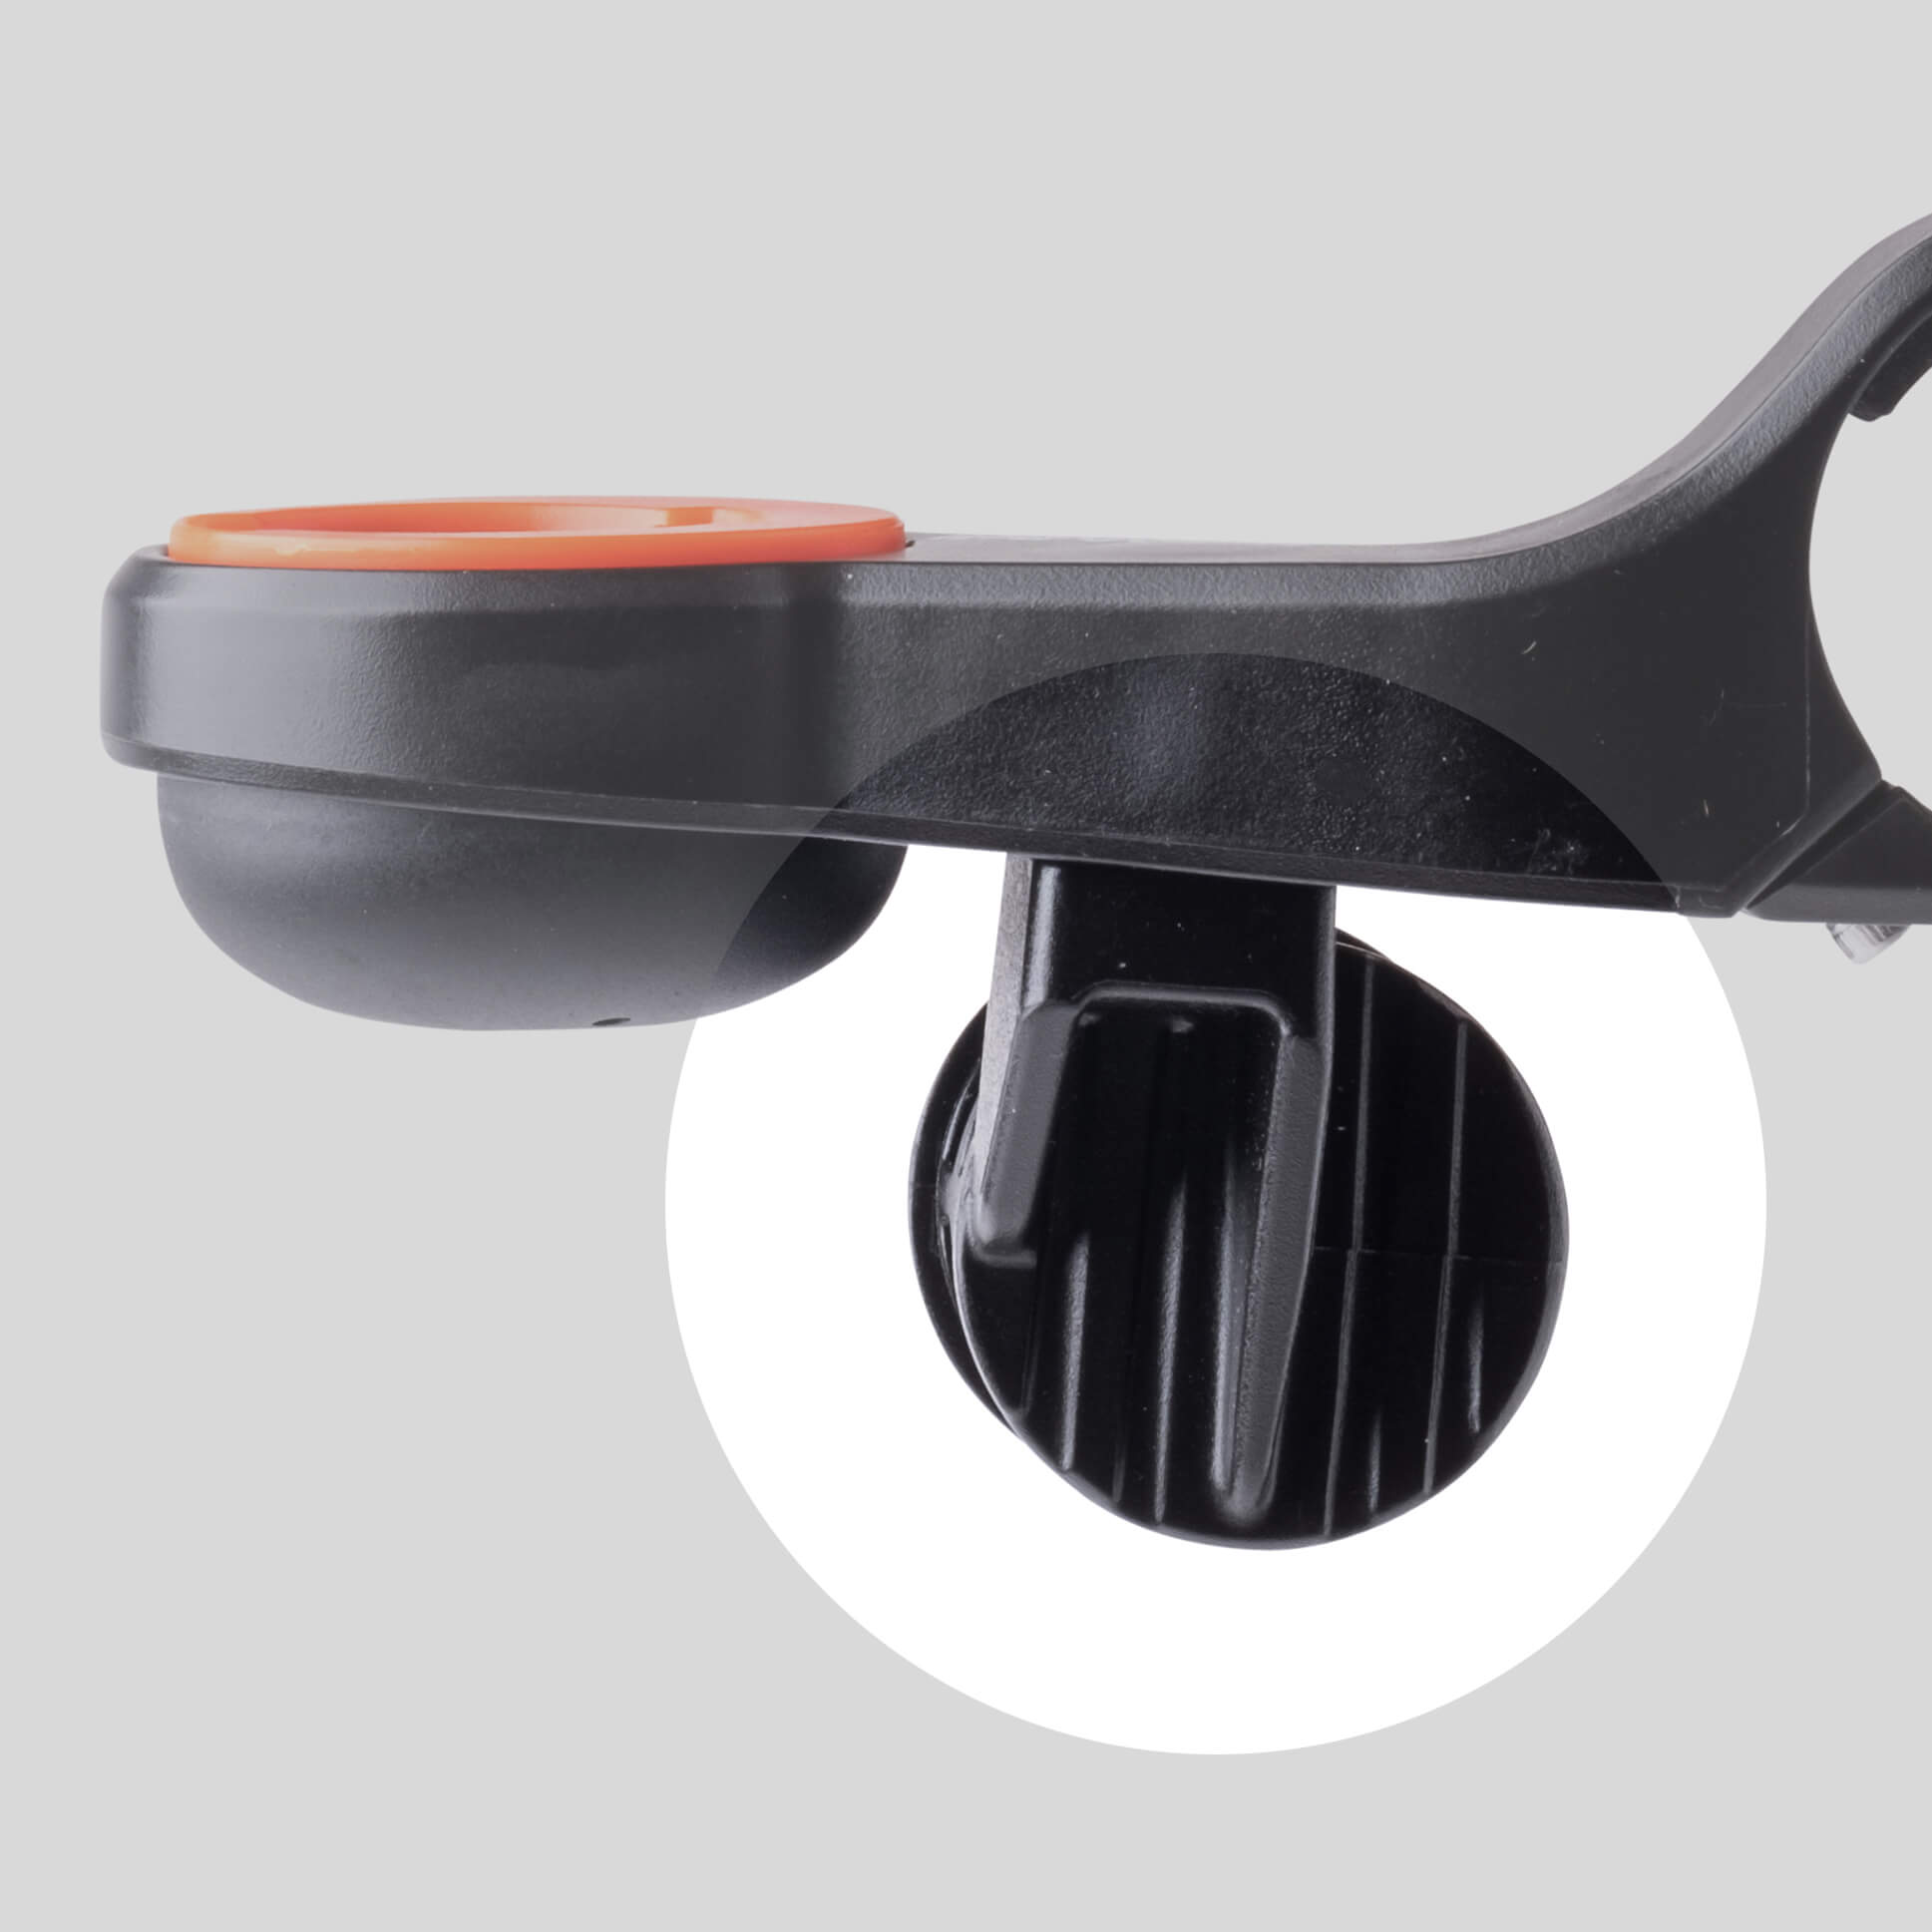 CloseTheGap uni light adapter